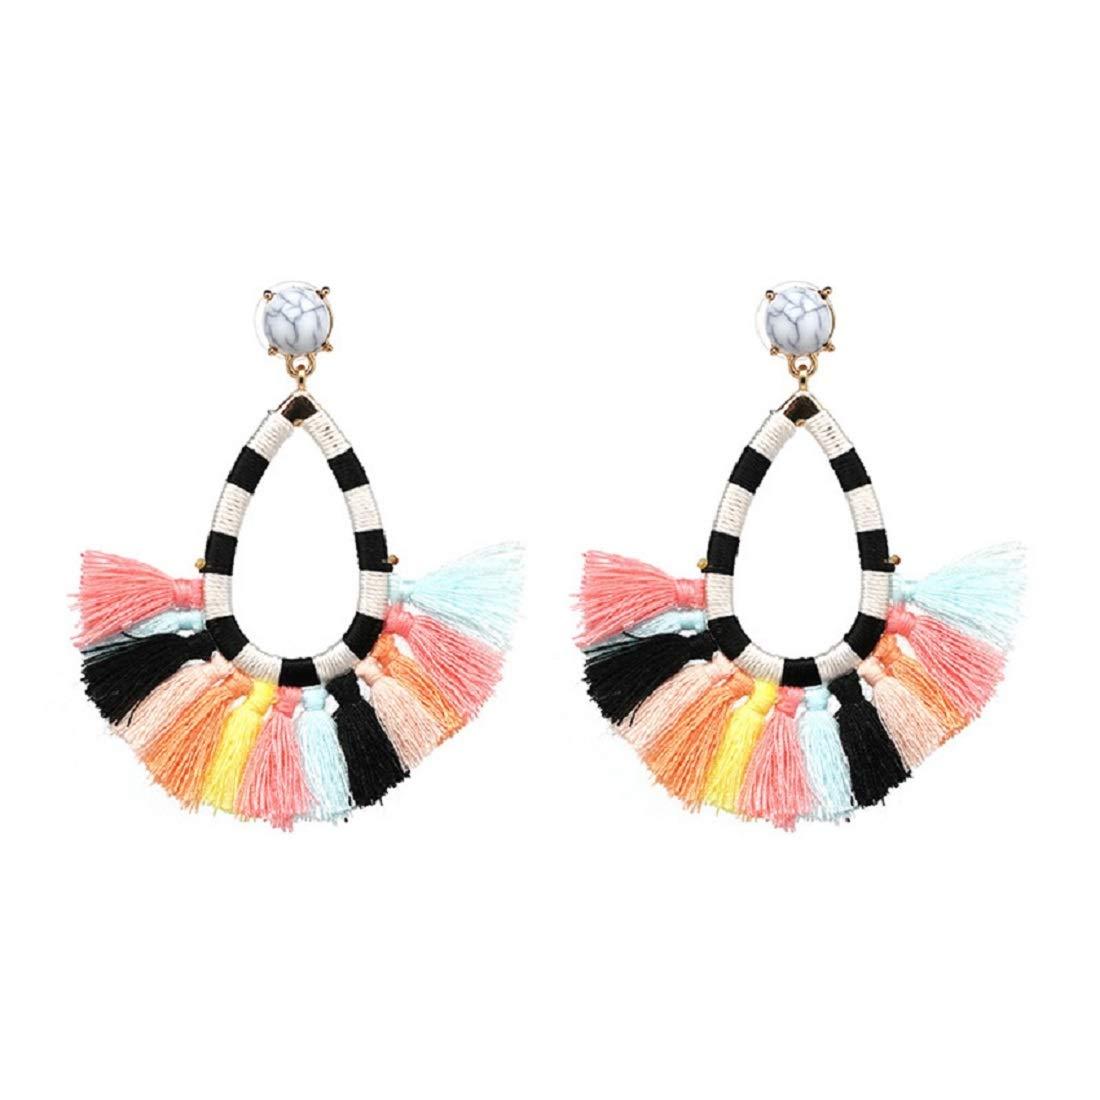 Surprise goods Beaded Tassel Earrings Long Fringe Drop Bohemian Earings Dangle 7 Colors